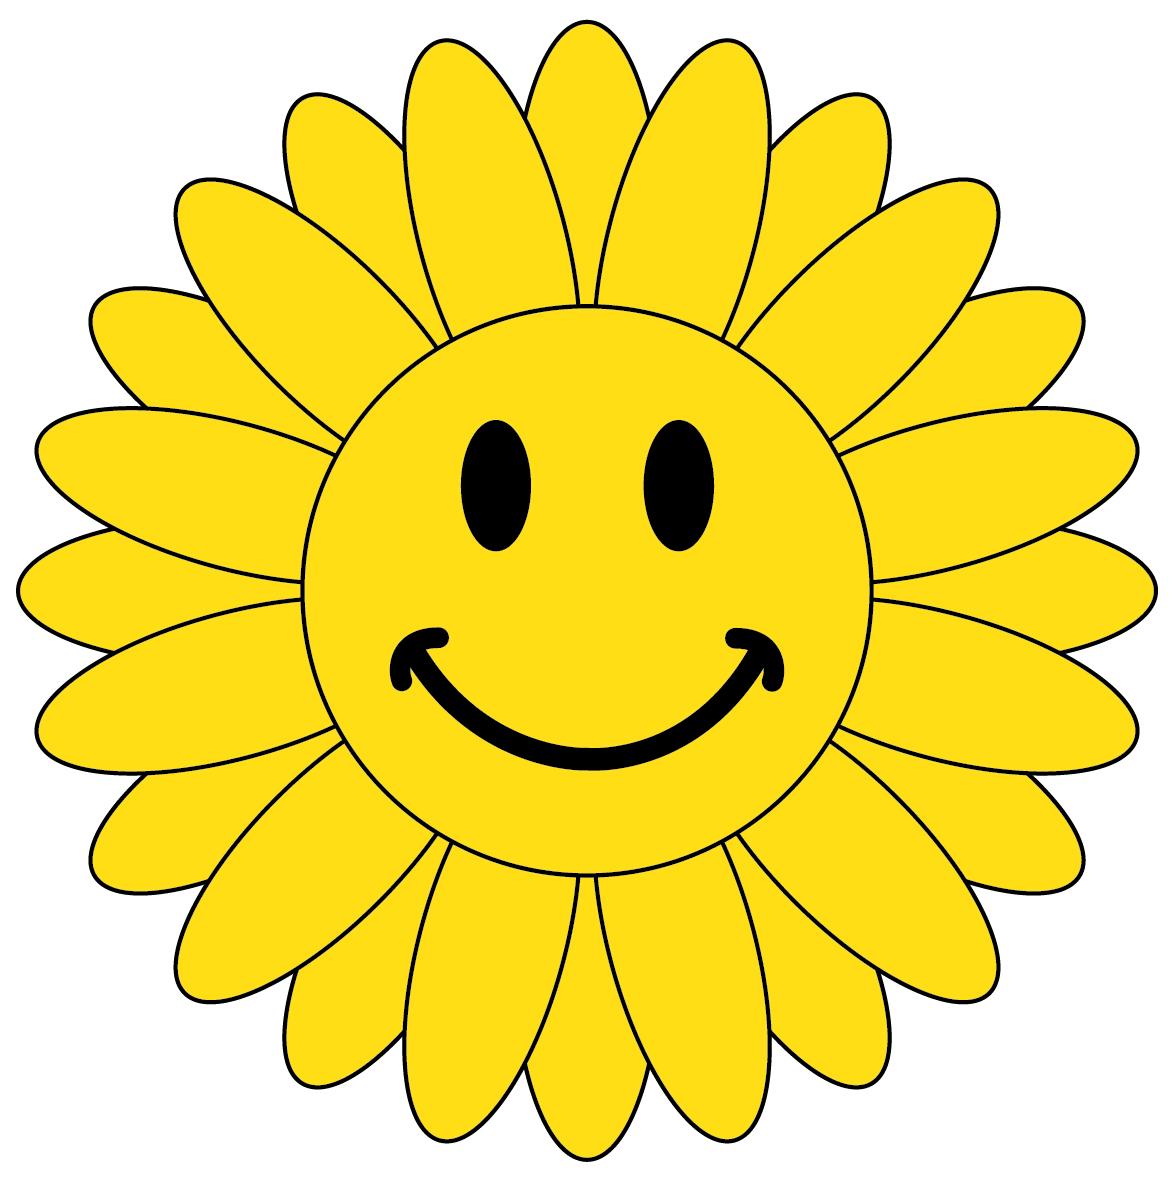 Smiley clipart sunflower.